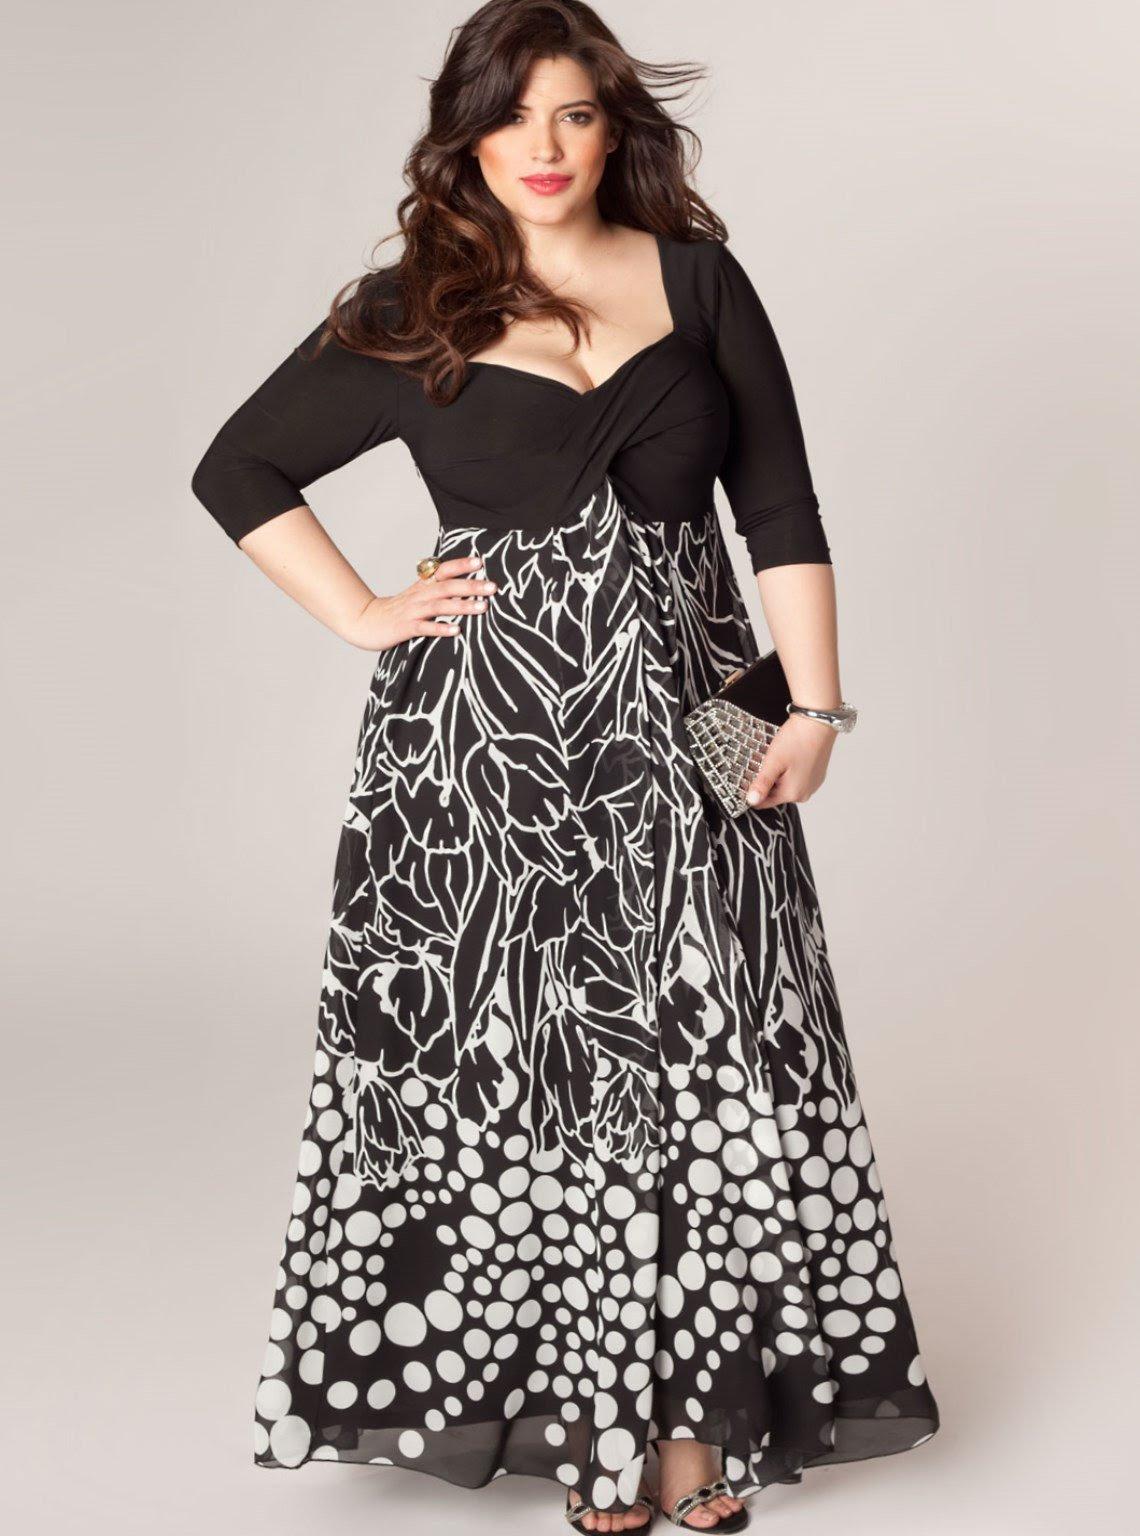 West new Bardot Flower Print Mermaid Maxi Dress yorkville toronto